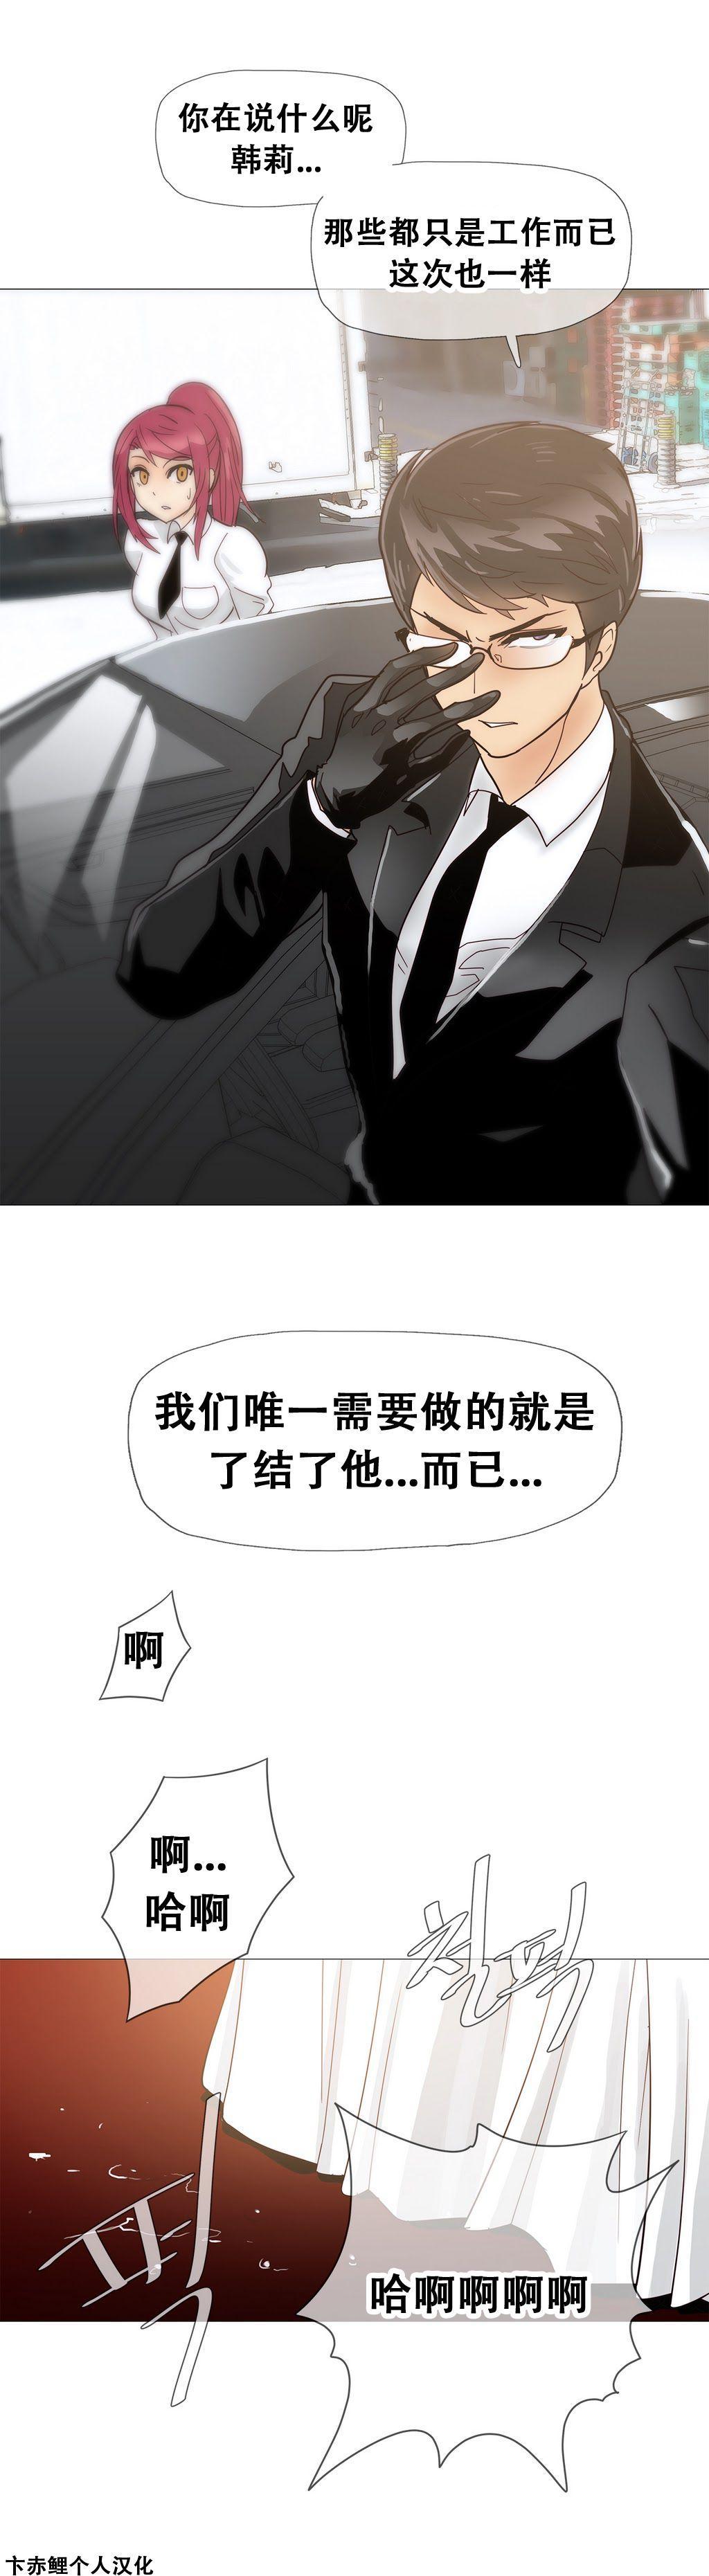 HouseHold Affairs 【卞赤鲤个人汉化】1~33话(持续更新中) 300